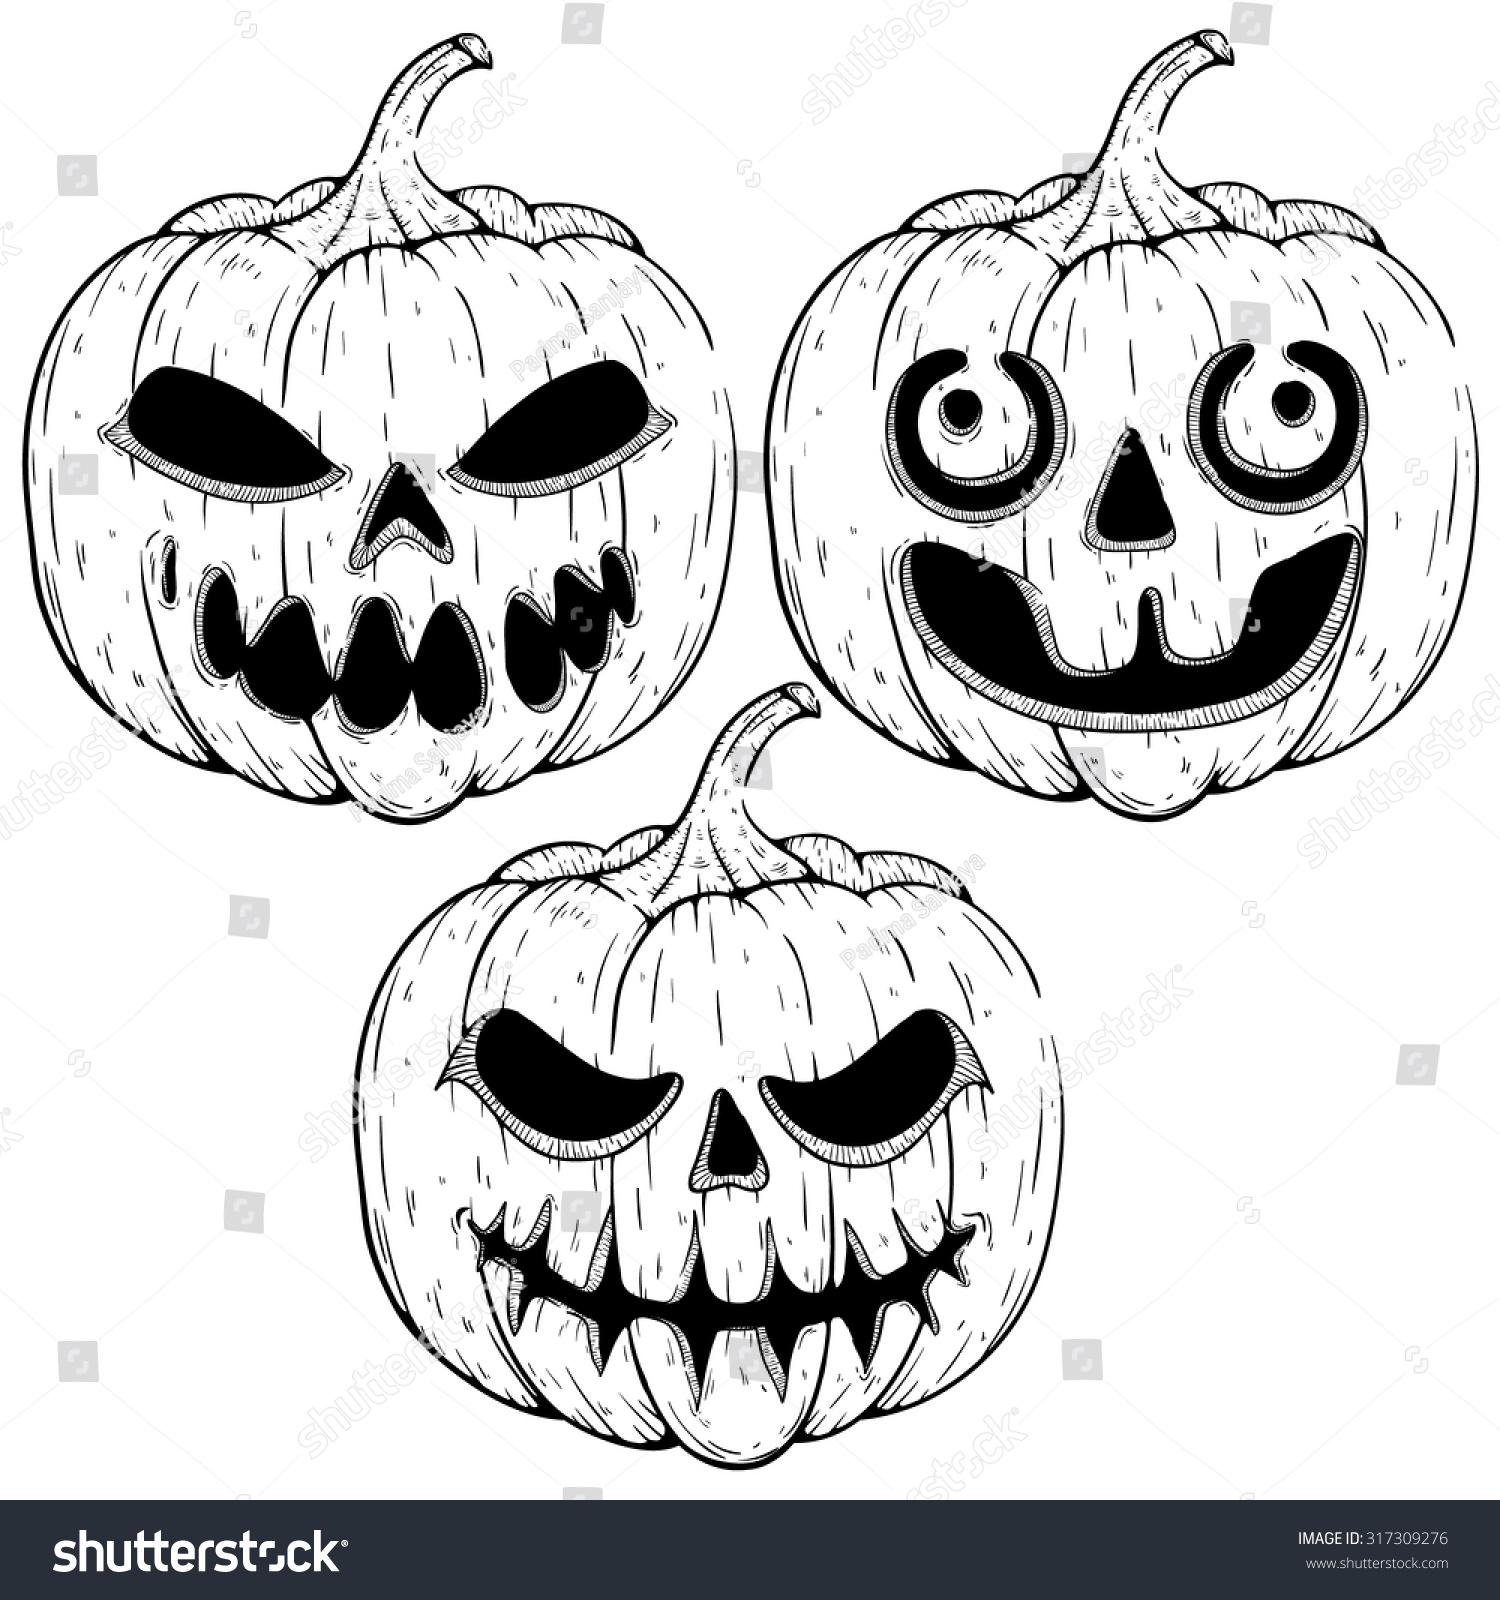 Creepy Halloween Pumpkin Drawings.Set Spooky Halloween Pumpkin Sketchy Style Stock Vector